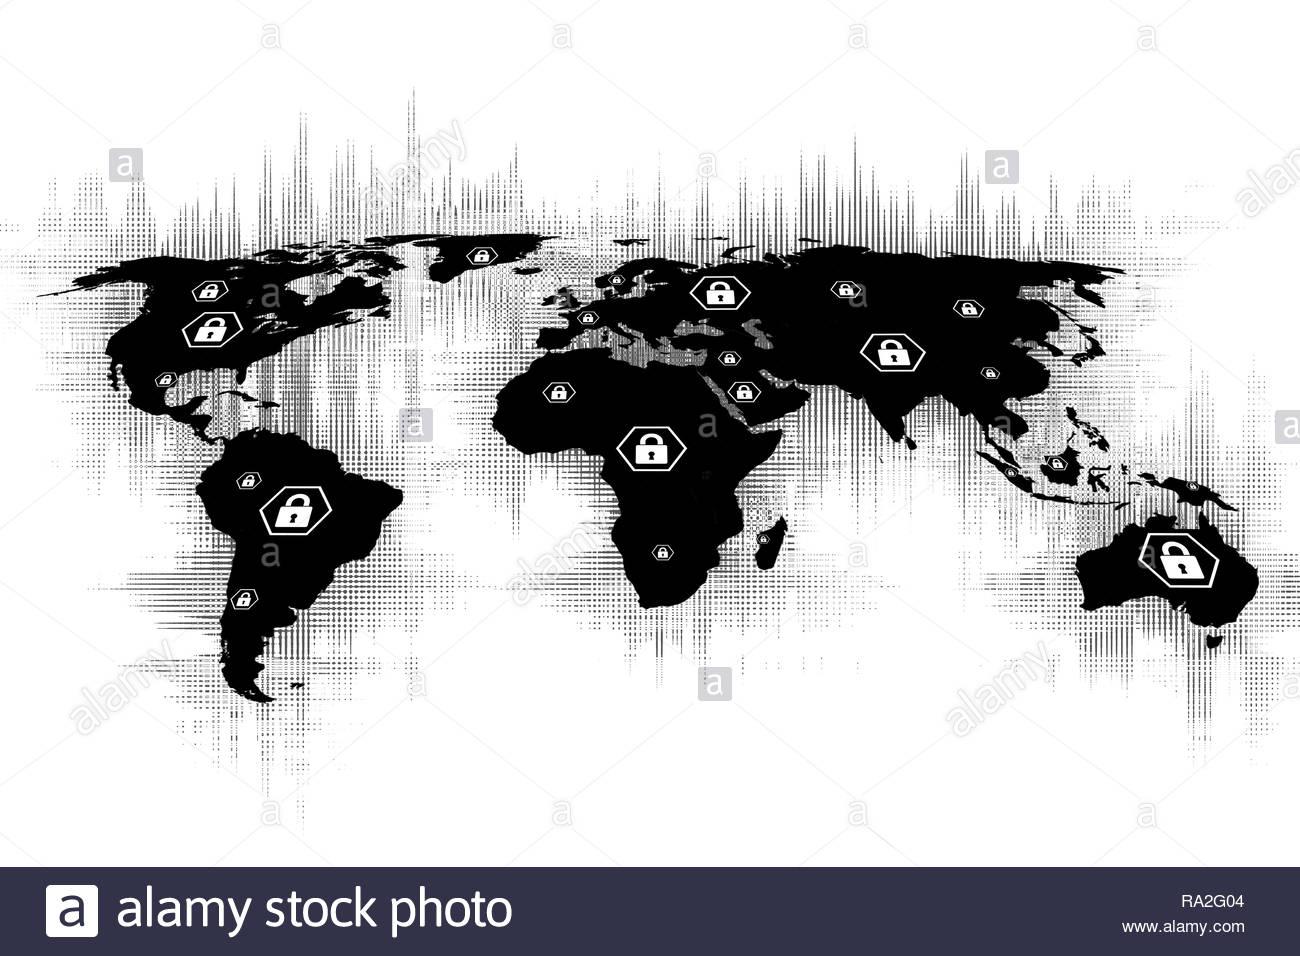 Imagen de un mapa del mundo con textura futurista e iconos de candados en los continentes. Mapa del mundo con candado vectores, secure internet o virtual secur Imagen De Stock